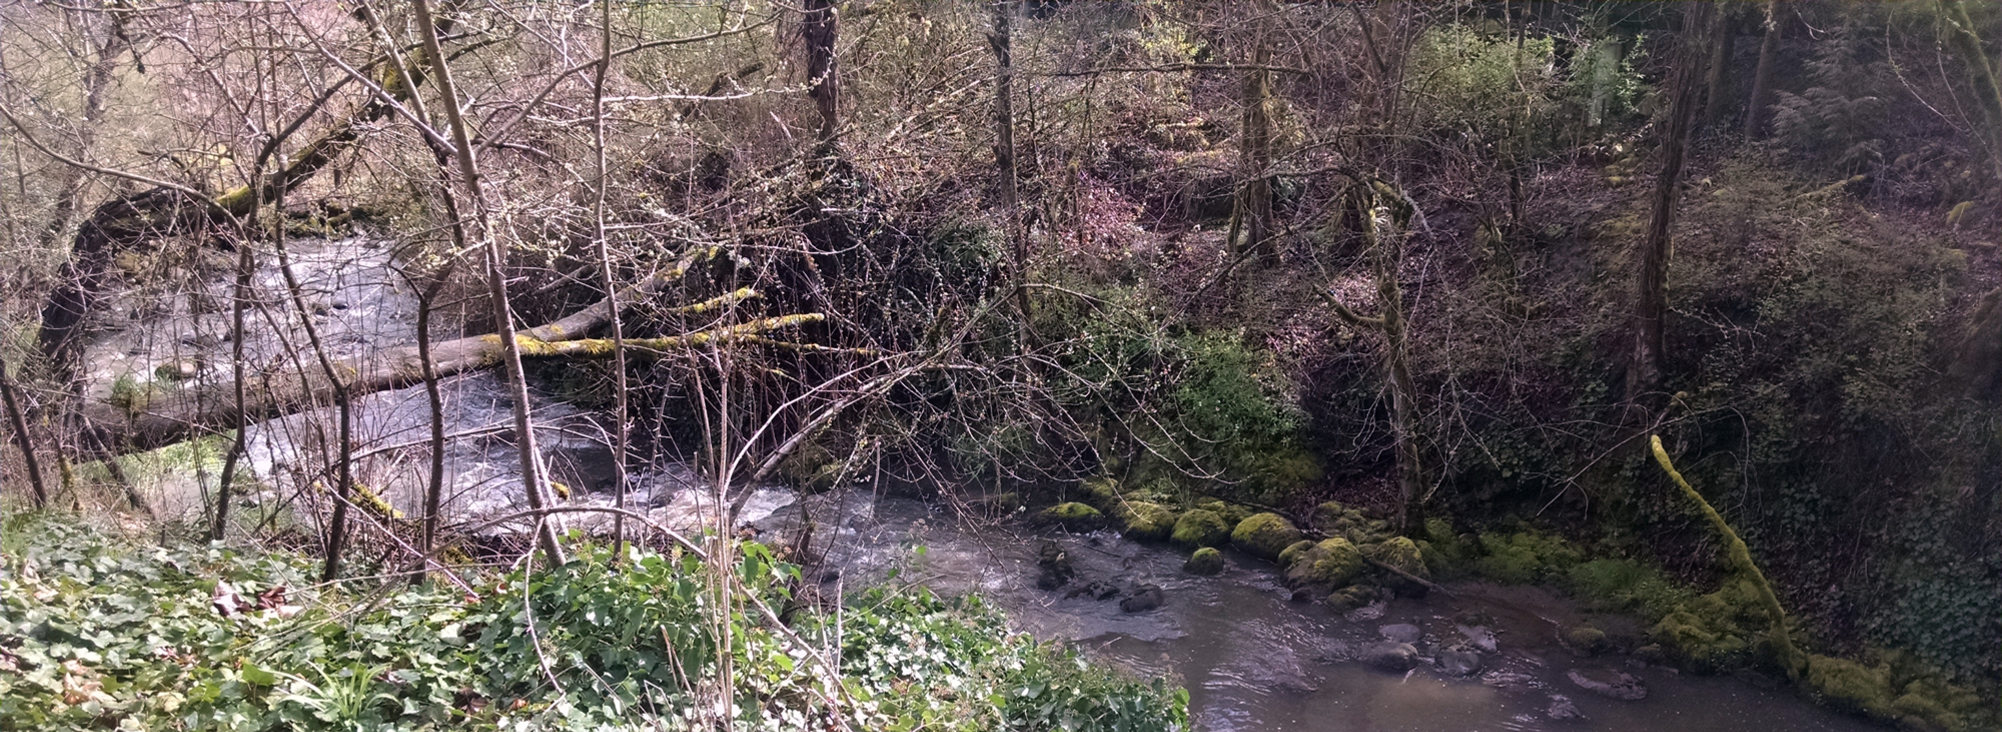 Fallen log over Tryon Creek